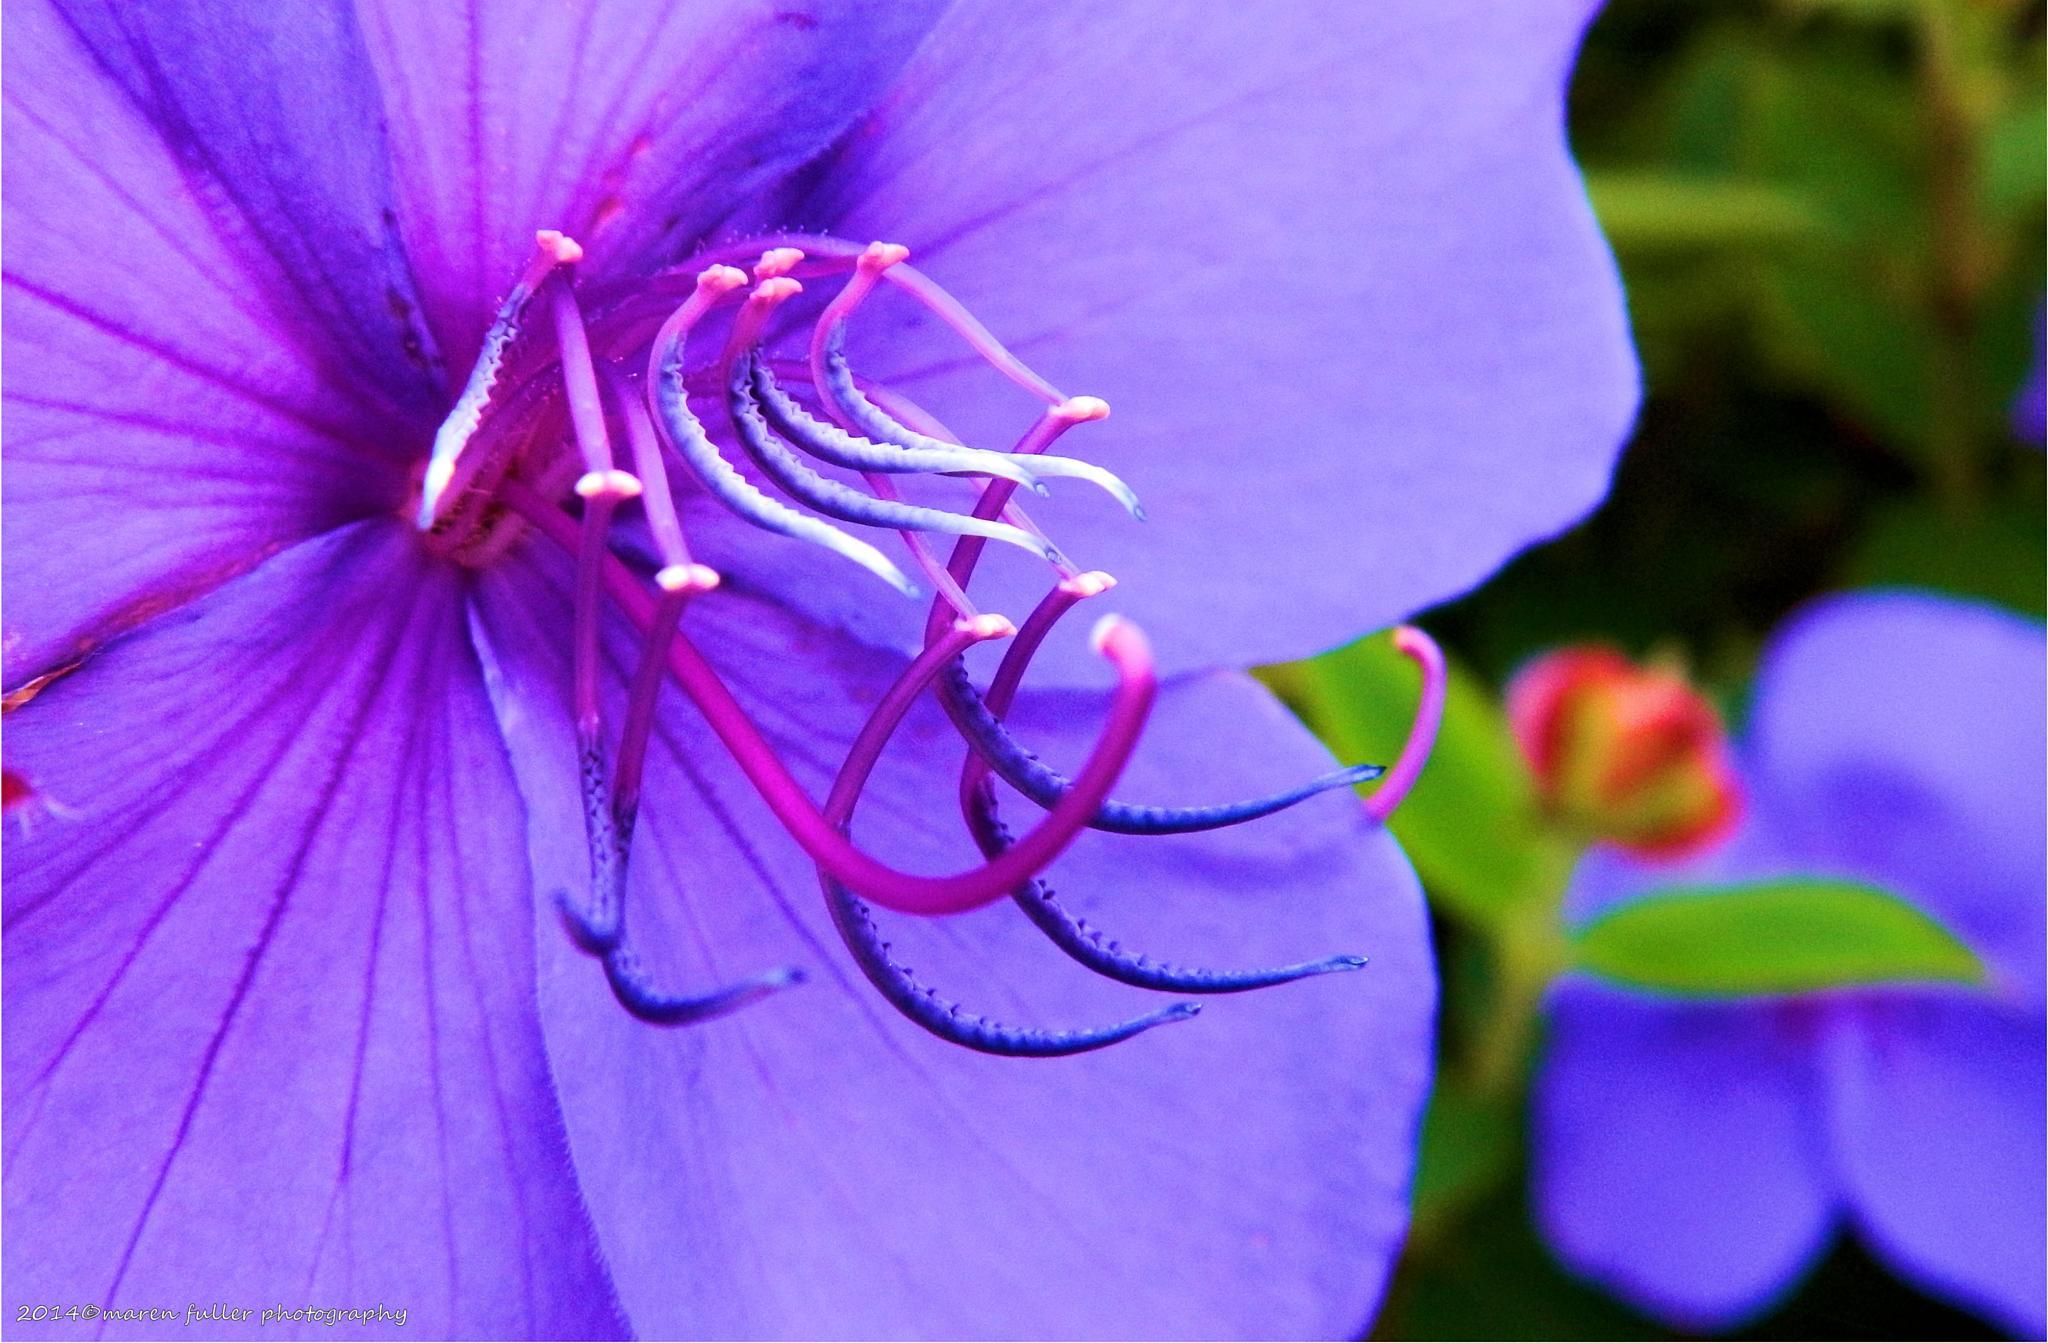 Purple Octopus flower by Maren Fuller Photography